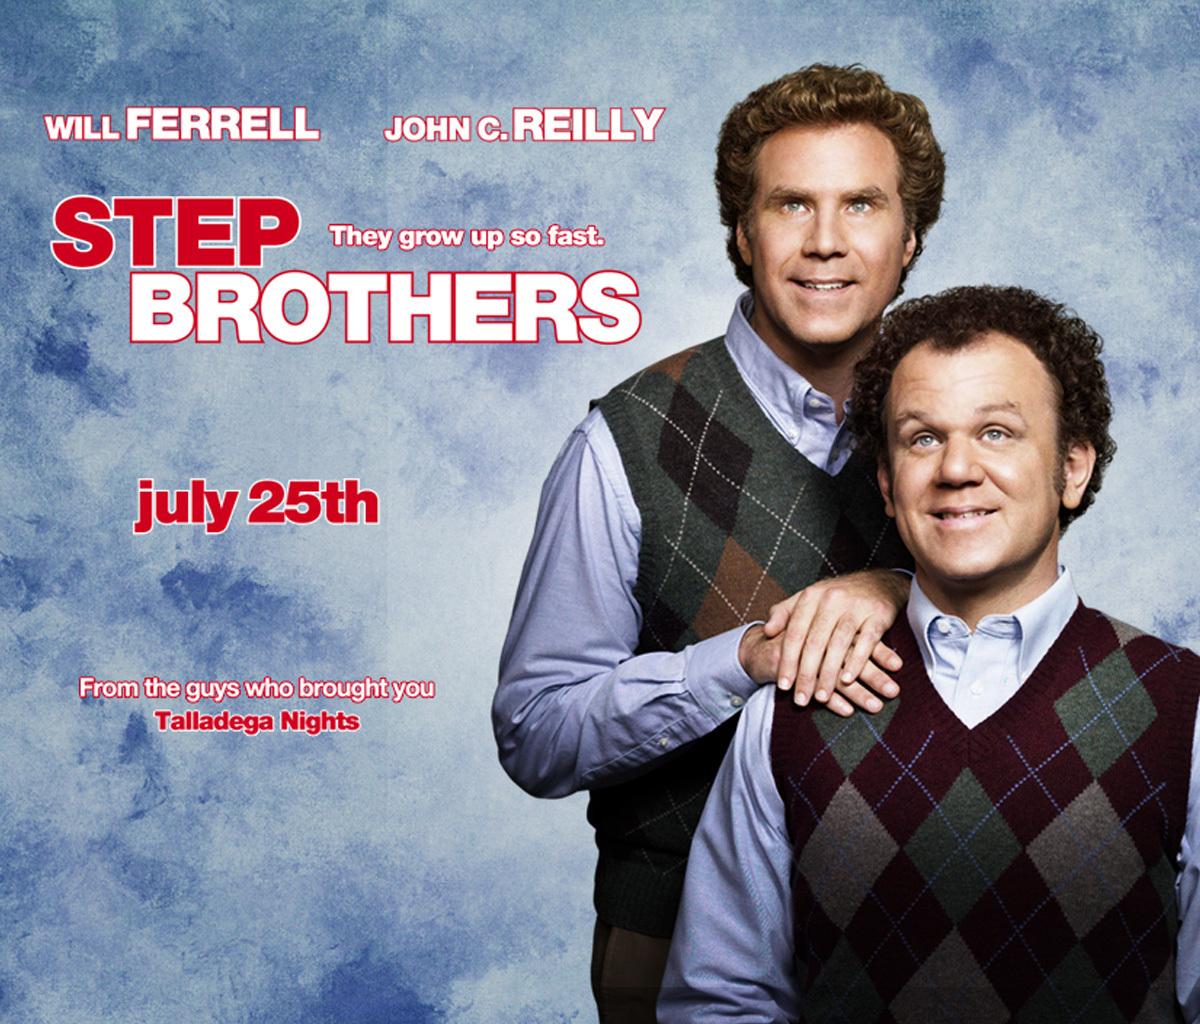 http://4.bp.blogspot.com/-ChVBSogbfCc/UG74v_BHoqI/AAAAAAAAAH8/yj8FuYDxU_M/s1600/Step-Brothers-step-brothers-5458999-1200-1024.jpg